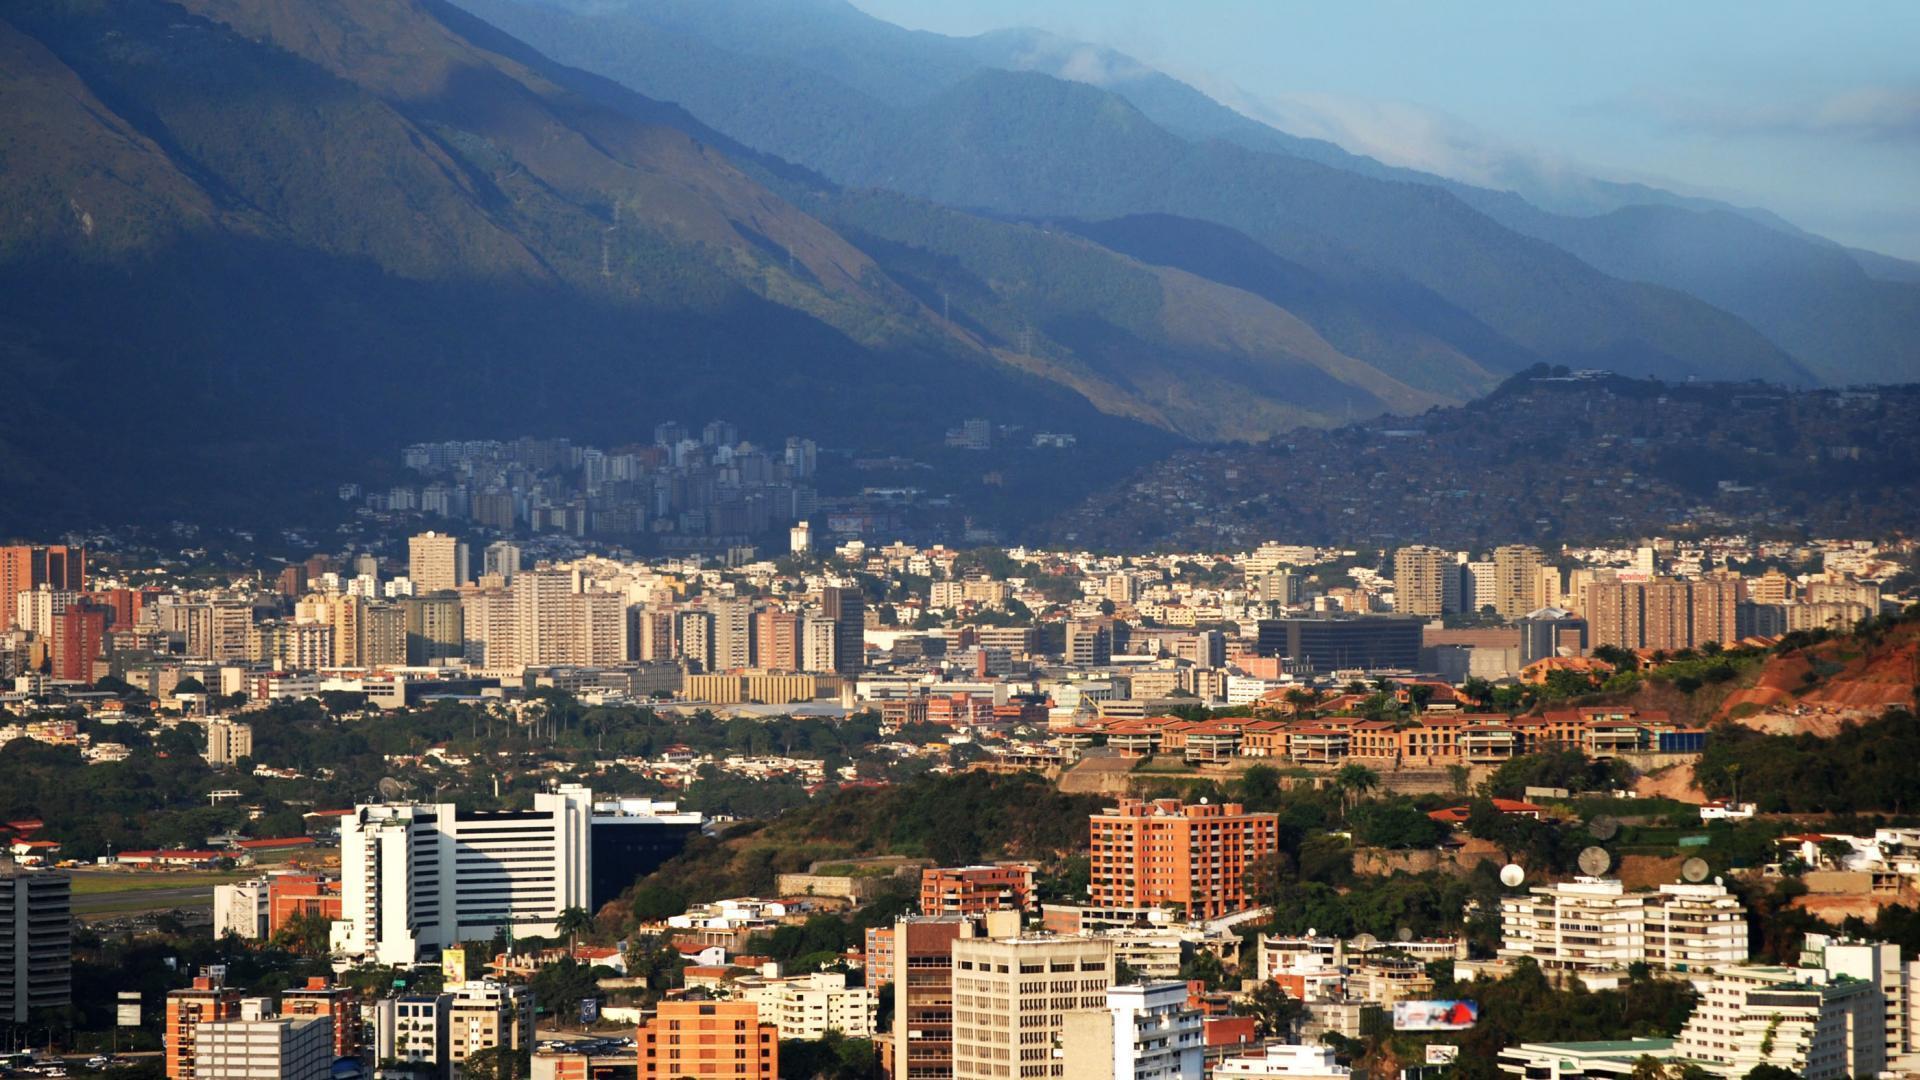 Venezuela Wallpapers for Free Download, 44 Venezuela HDQ Cover ...